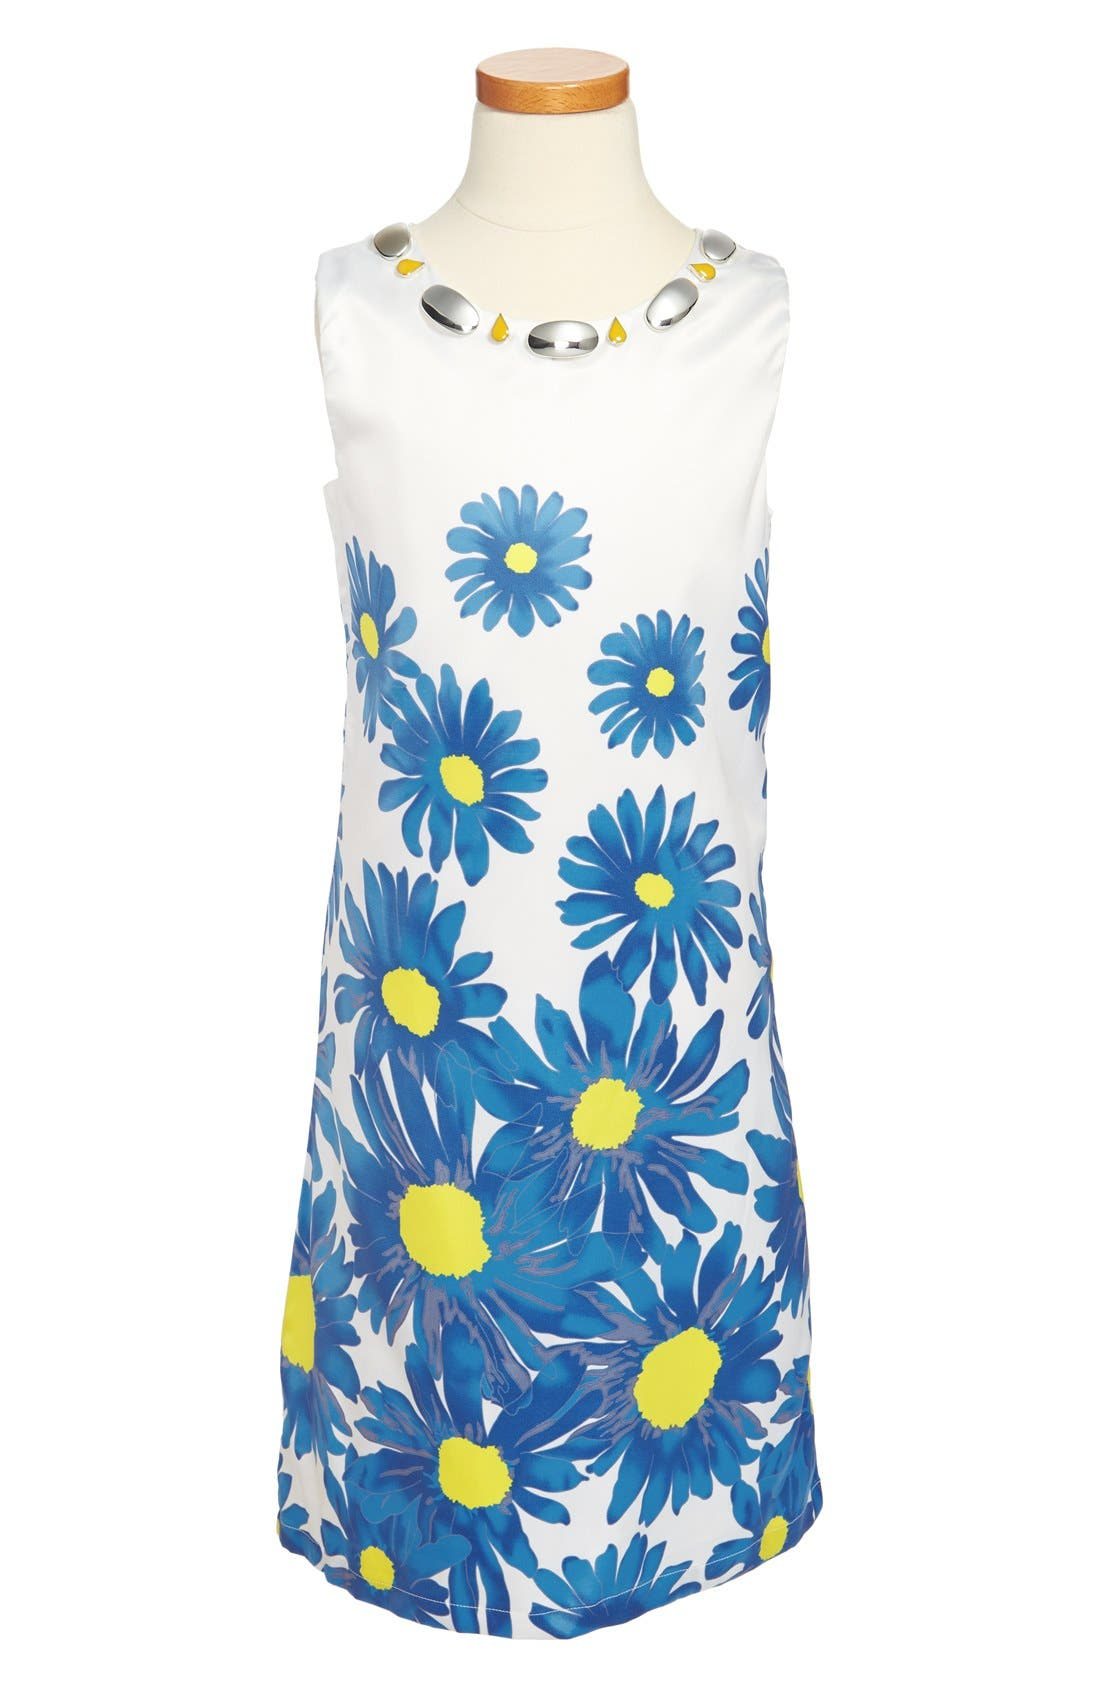 Alternate Image 1 Selected - Laundry by Shelli Segal Embellished Sheath Dress (Big Girls)